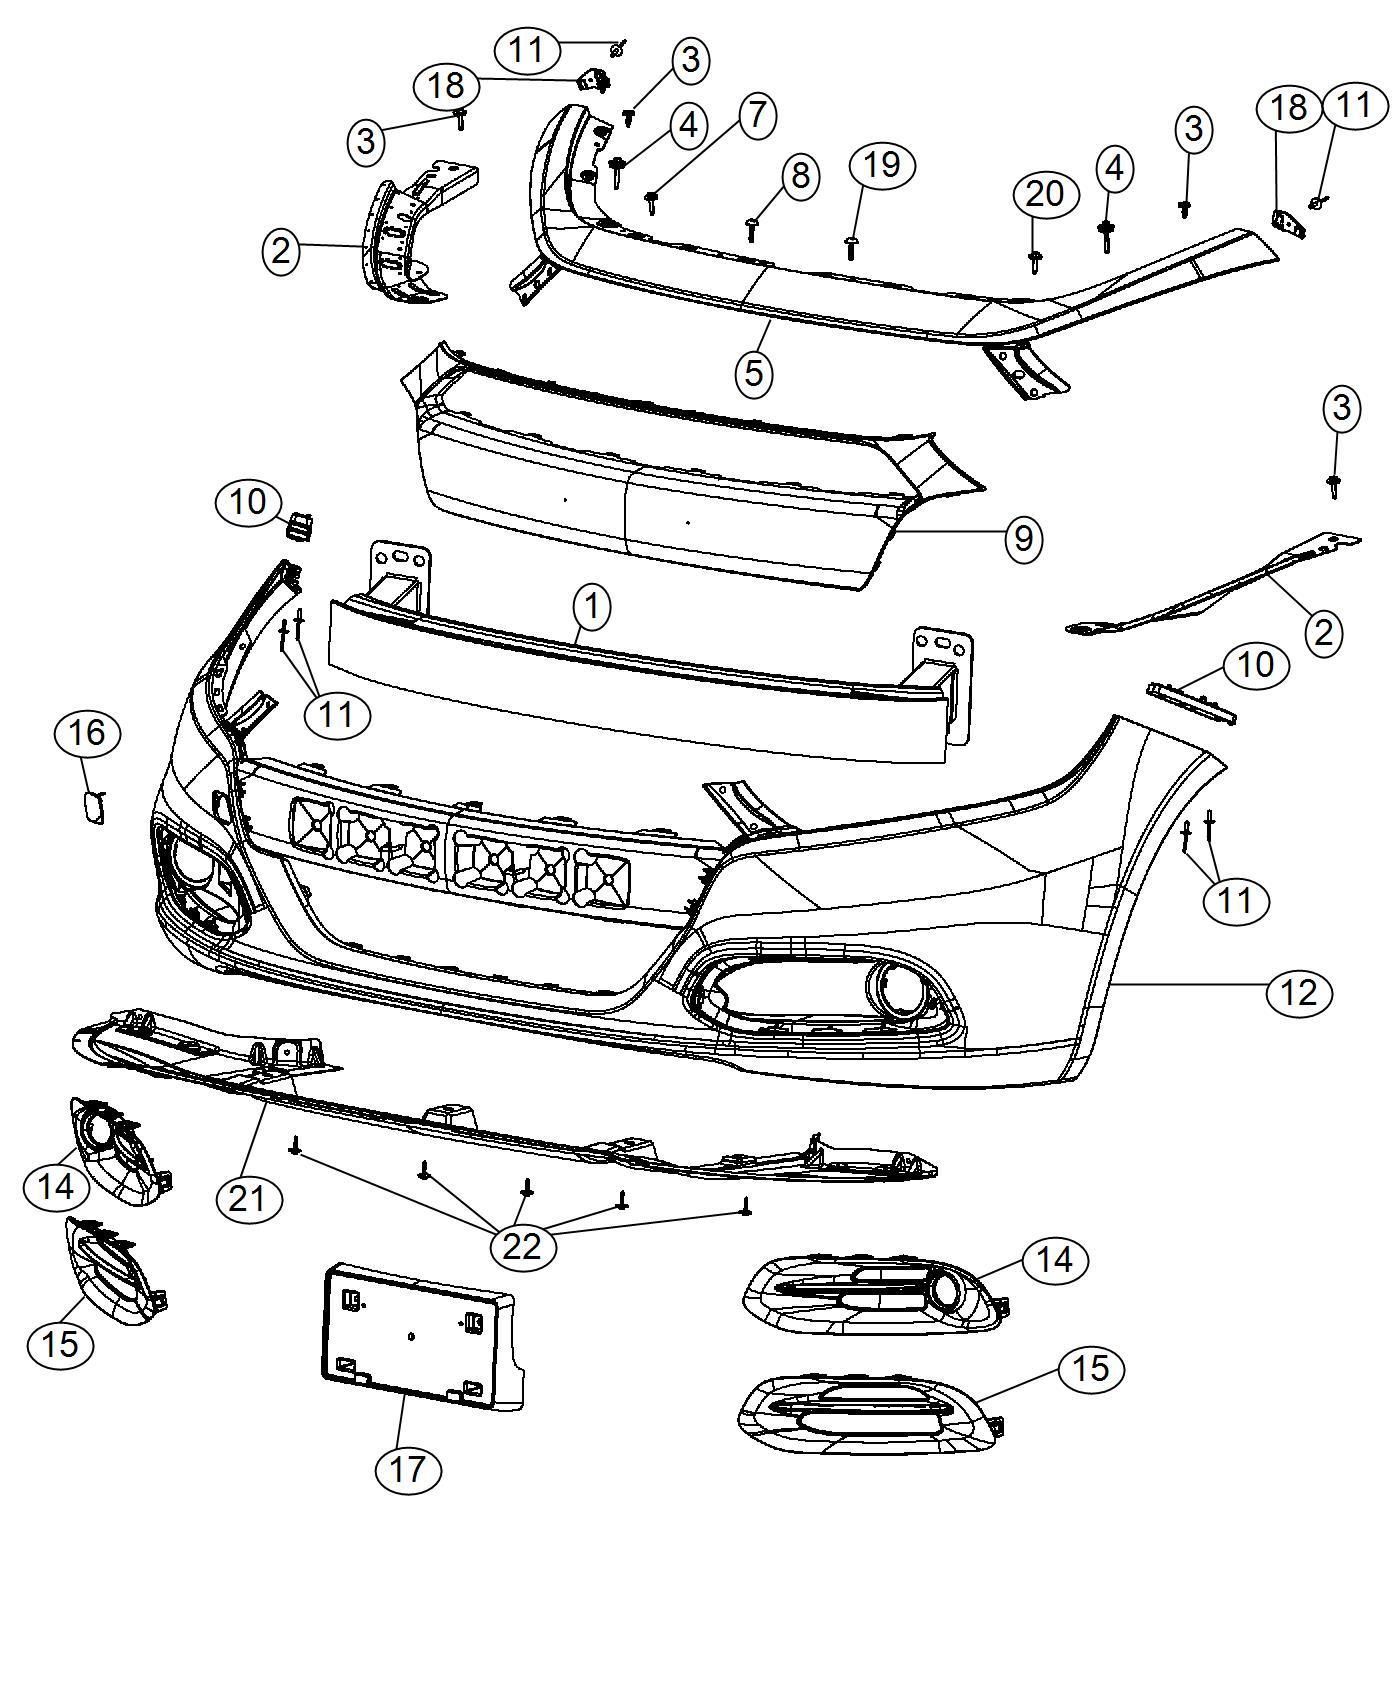 2016 Dodge Dart Spat. Front fascia. Right. Fuel, economy